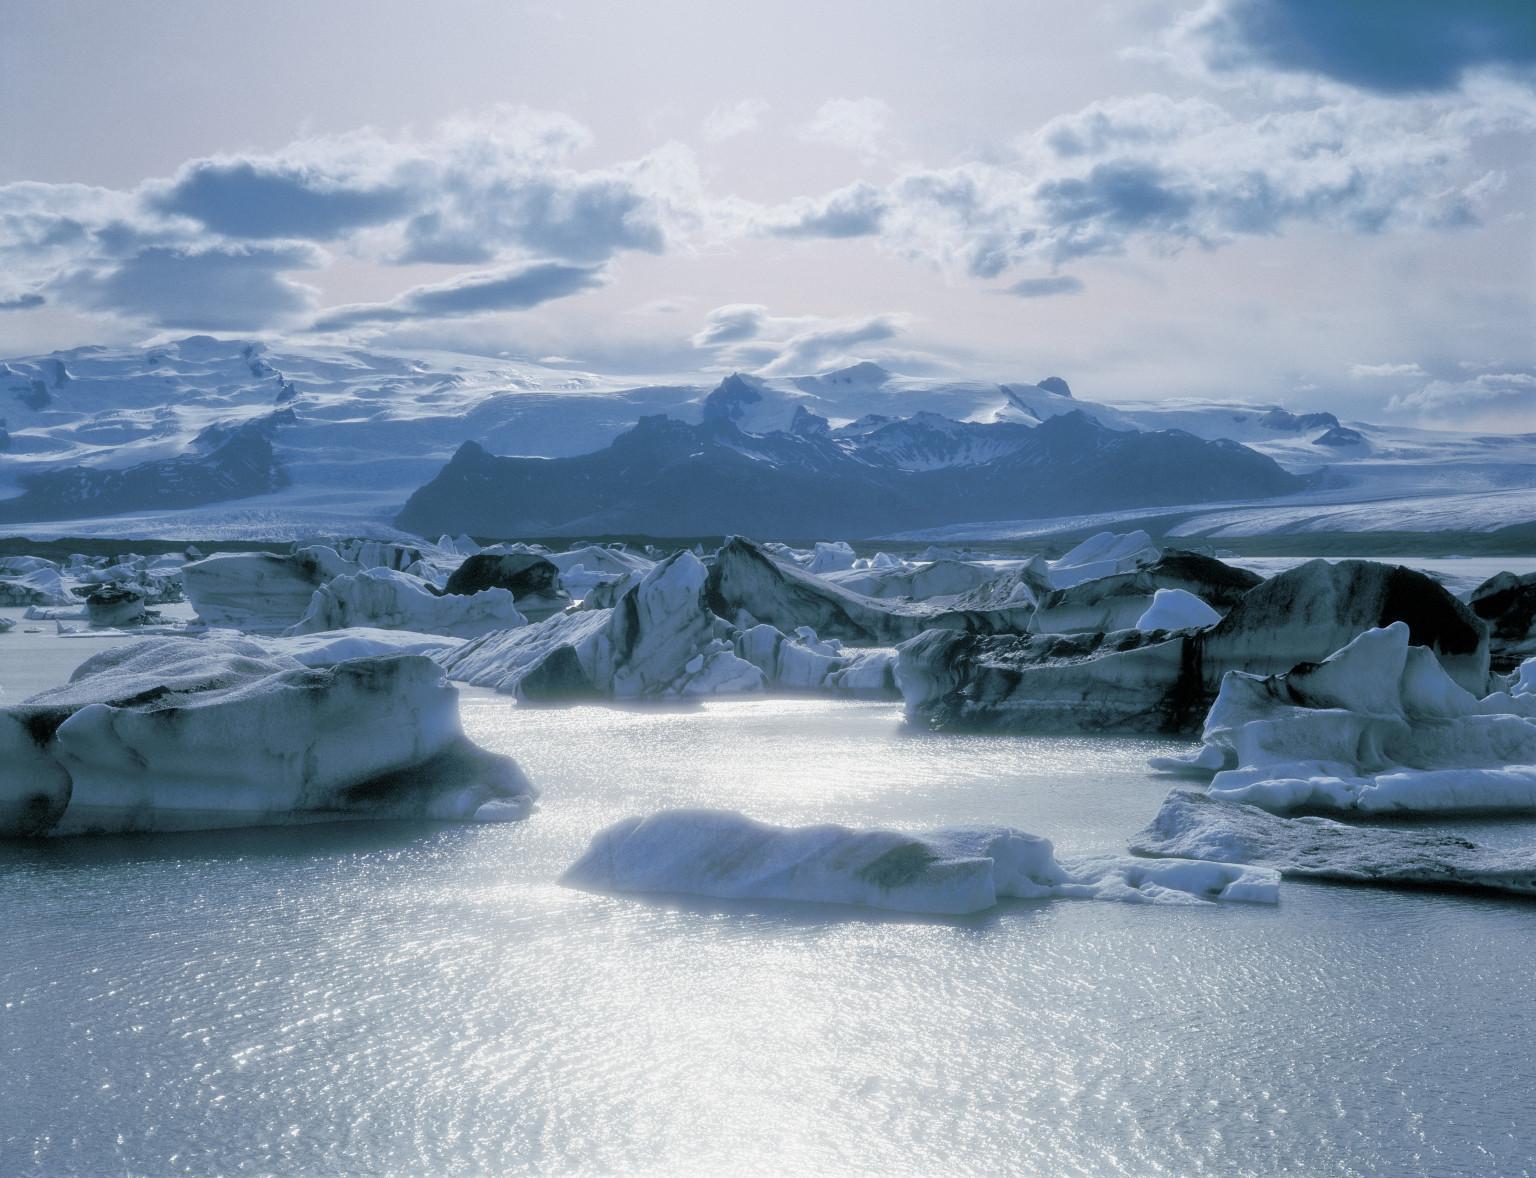 Arctic Ice Melt Sea Ice Loss Threatens Entire Arctic